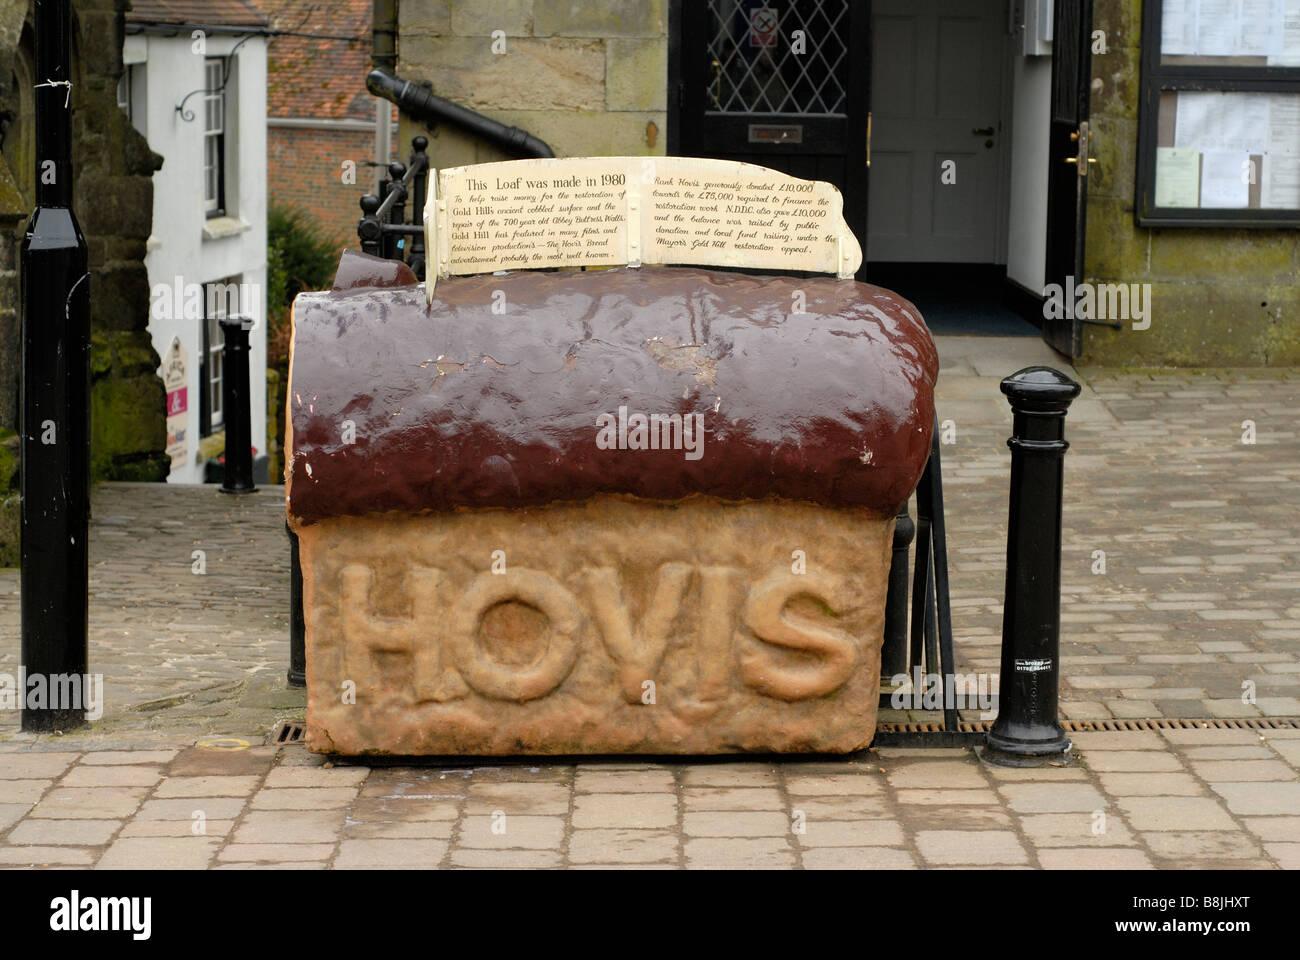 Giant Hovis Loaf model Shaftesbury - Stock Image